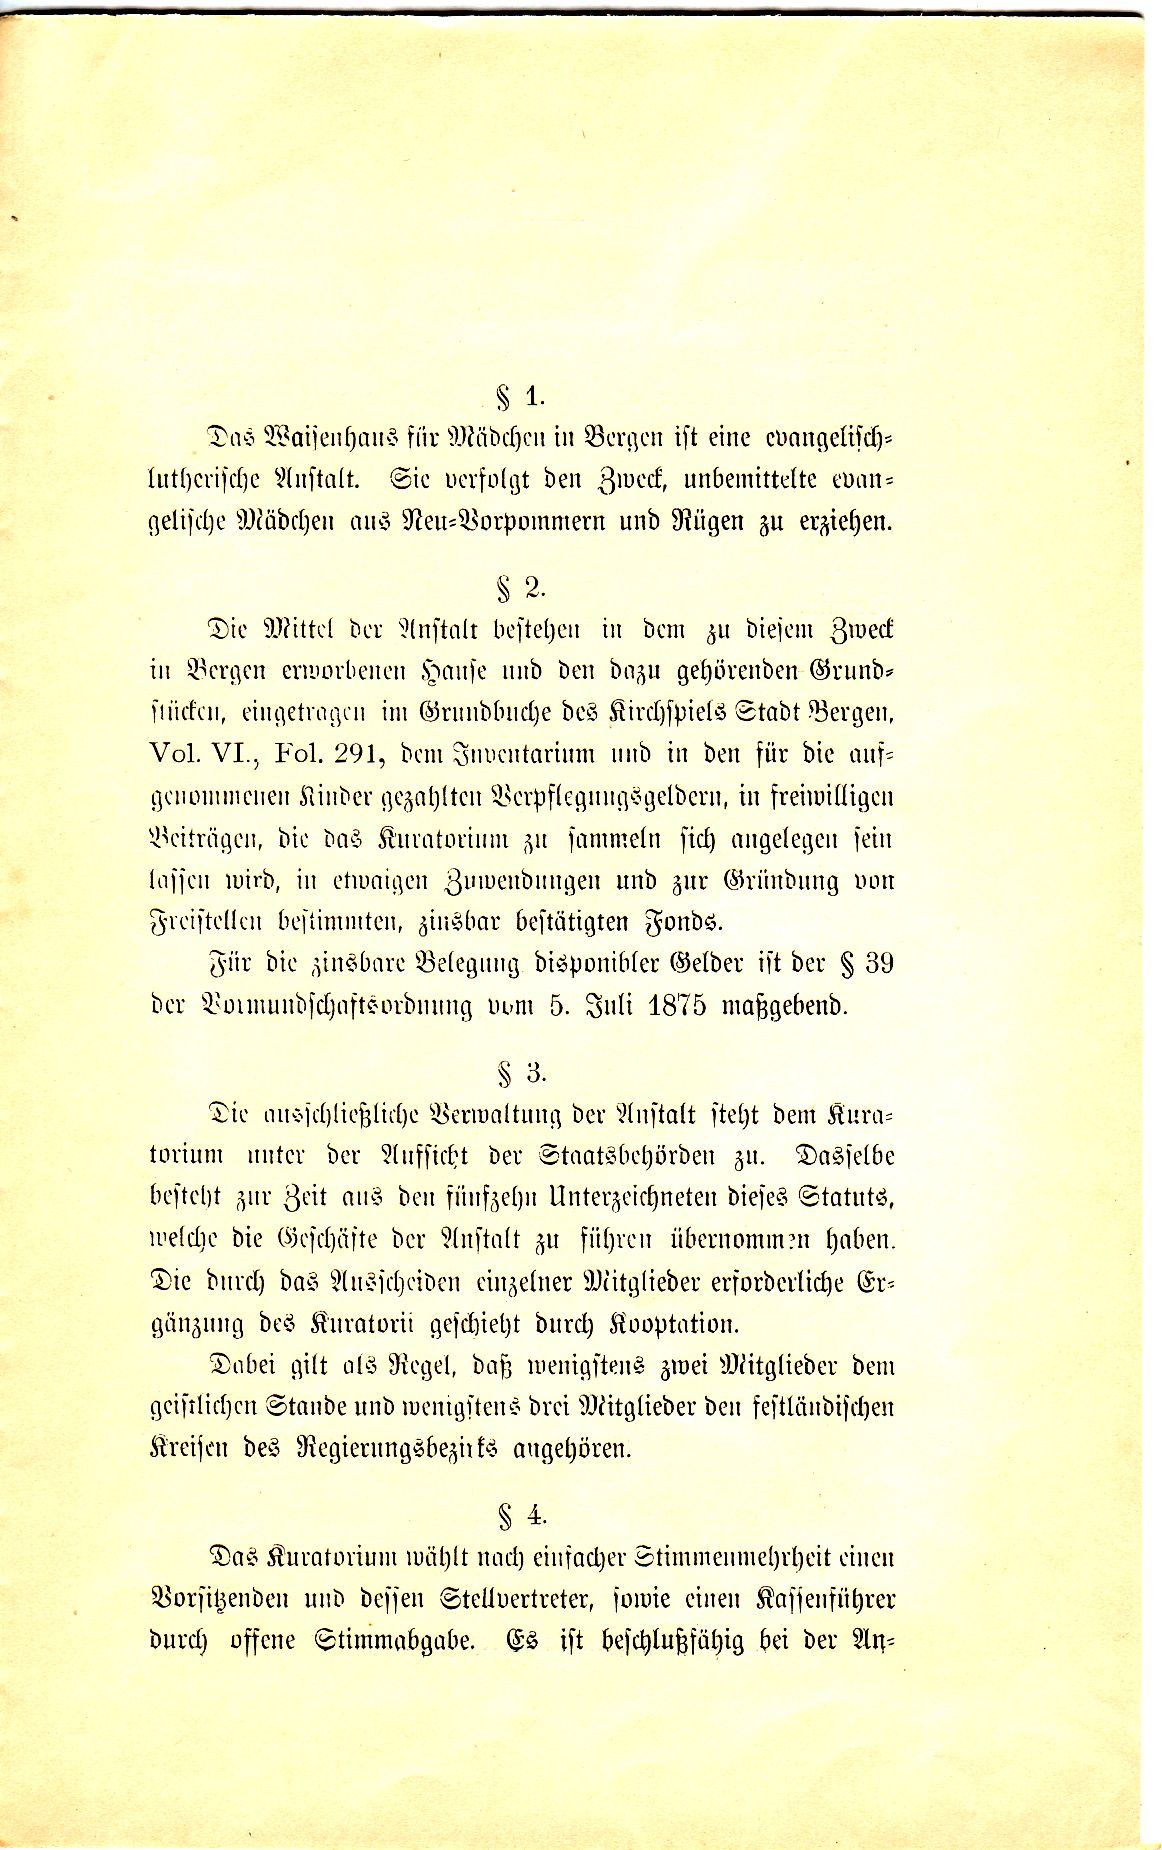 Statut Seite 2